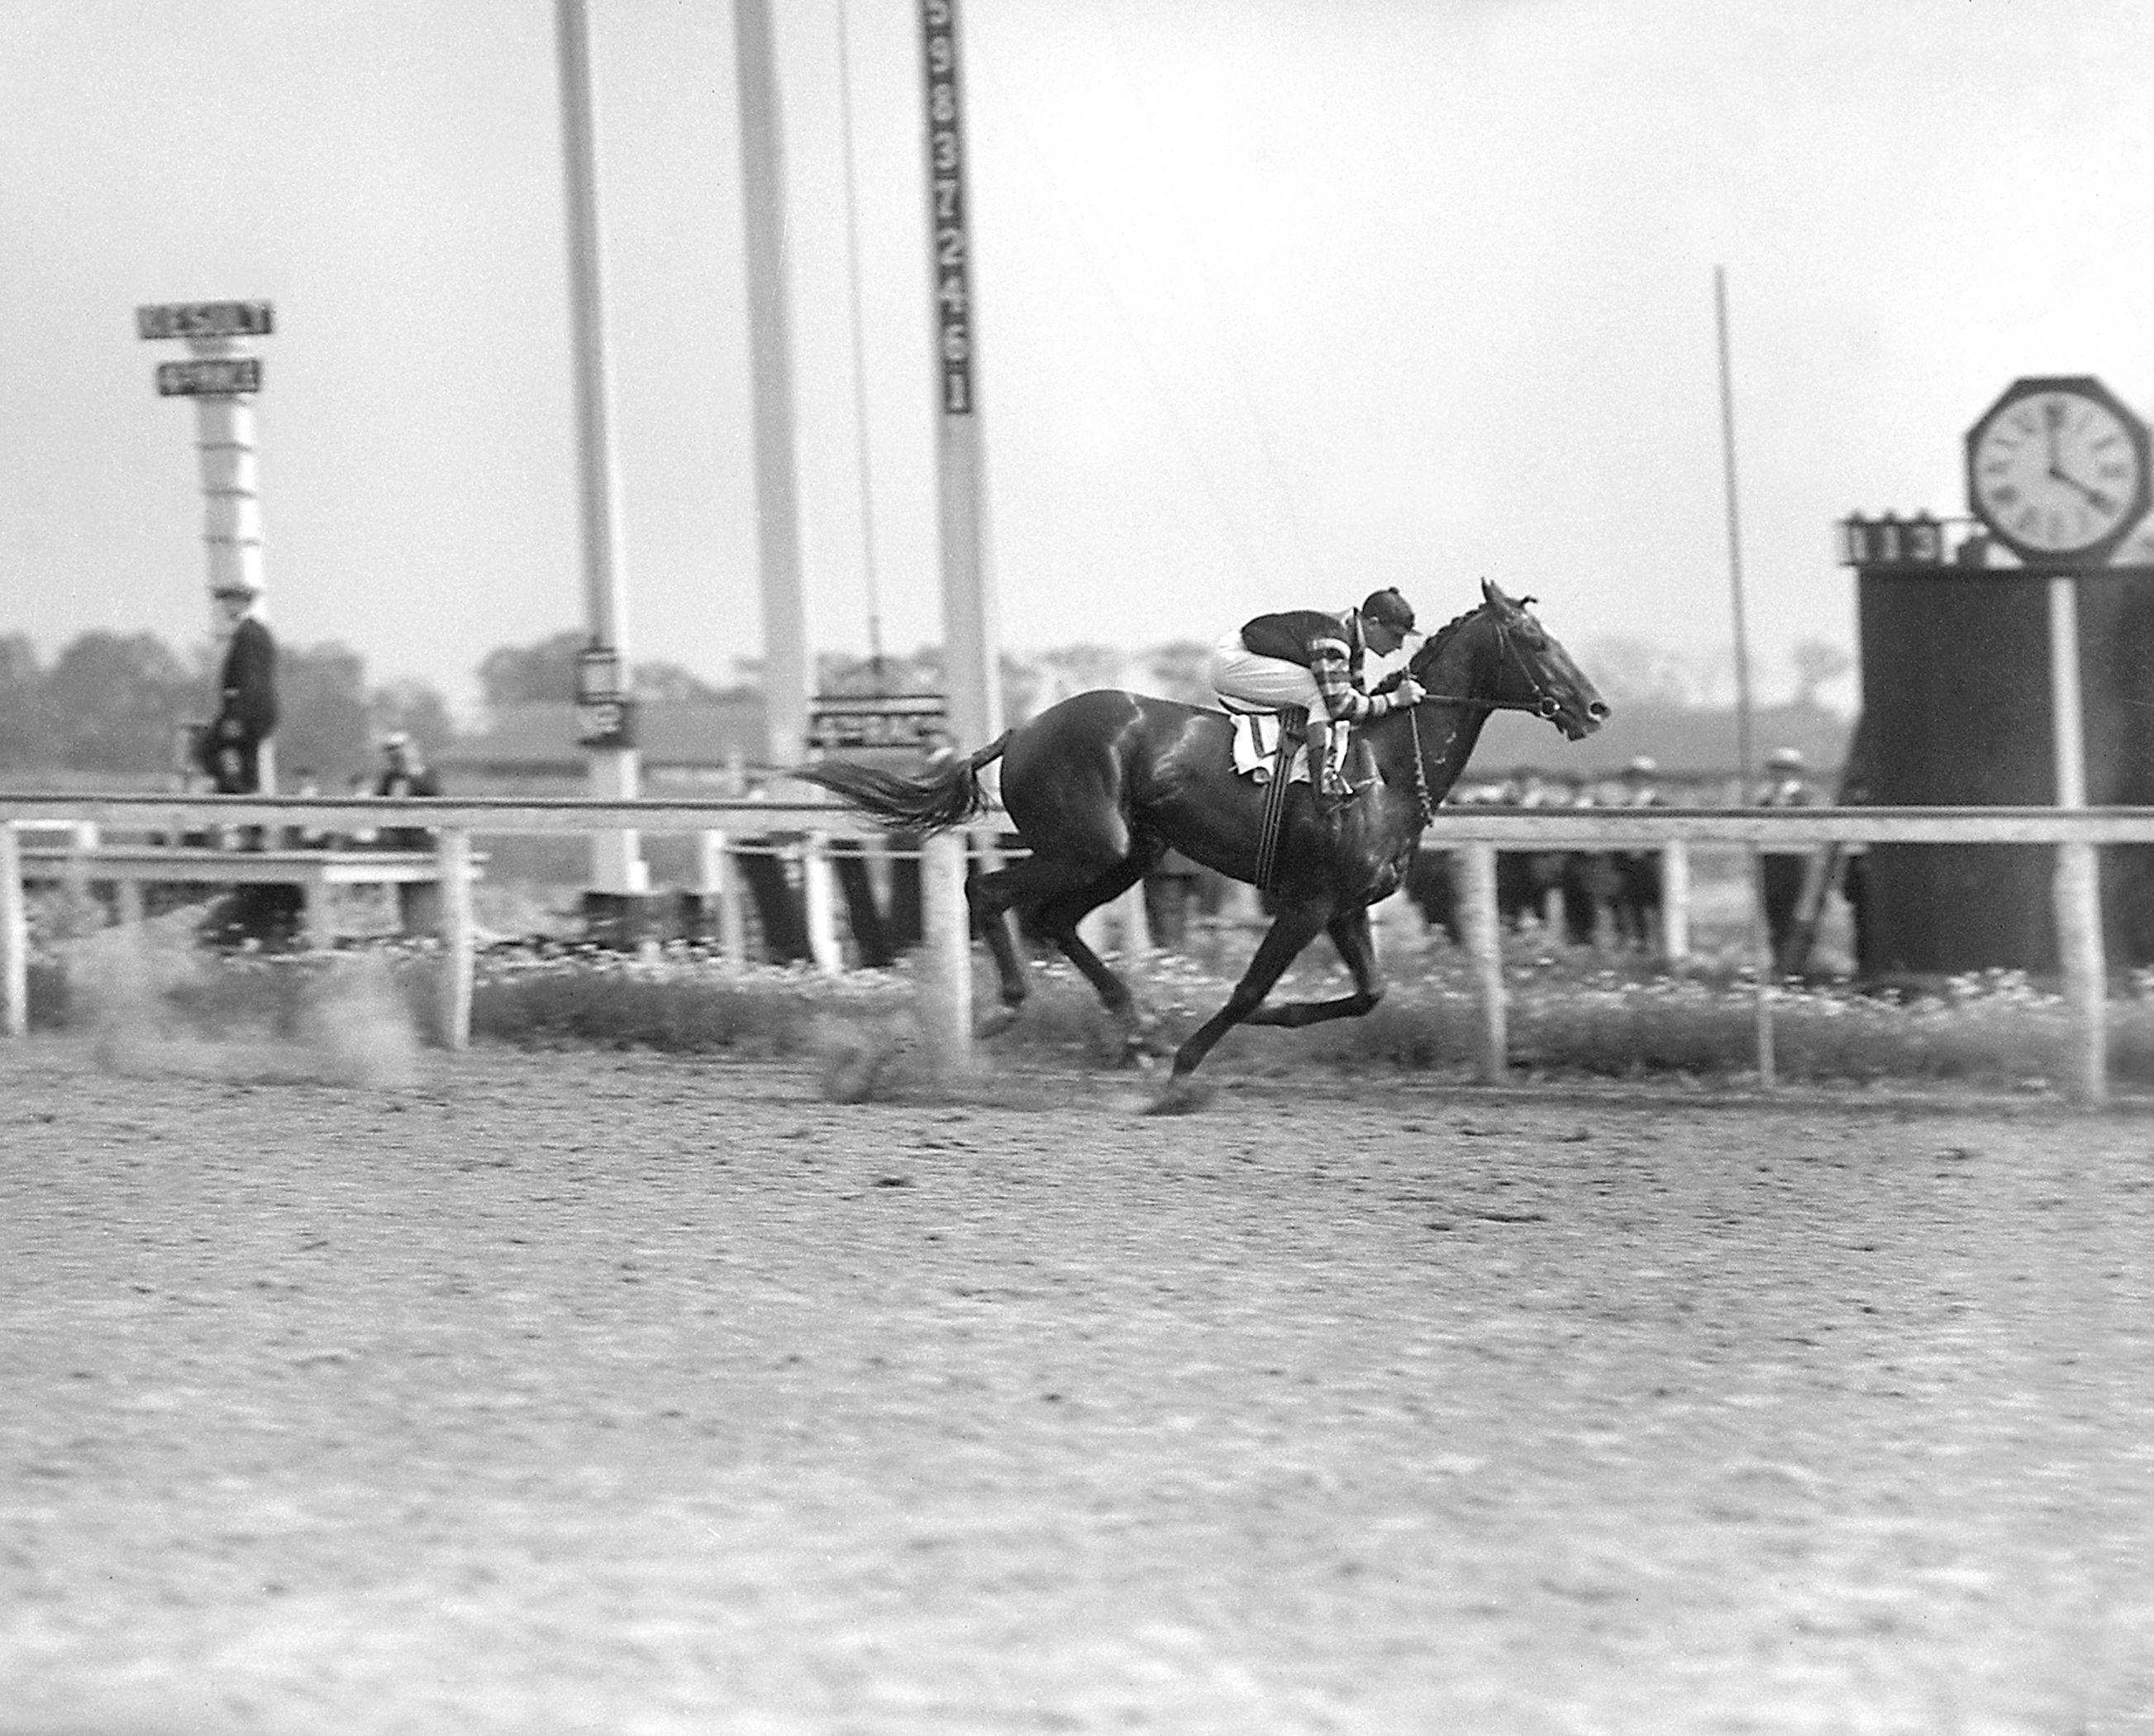 Man o' War (Clarence Kummer up) winning the 1920 Stuyvesant Handicap (Keeneland Library Cook Collection)